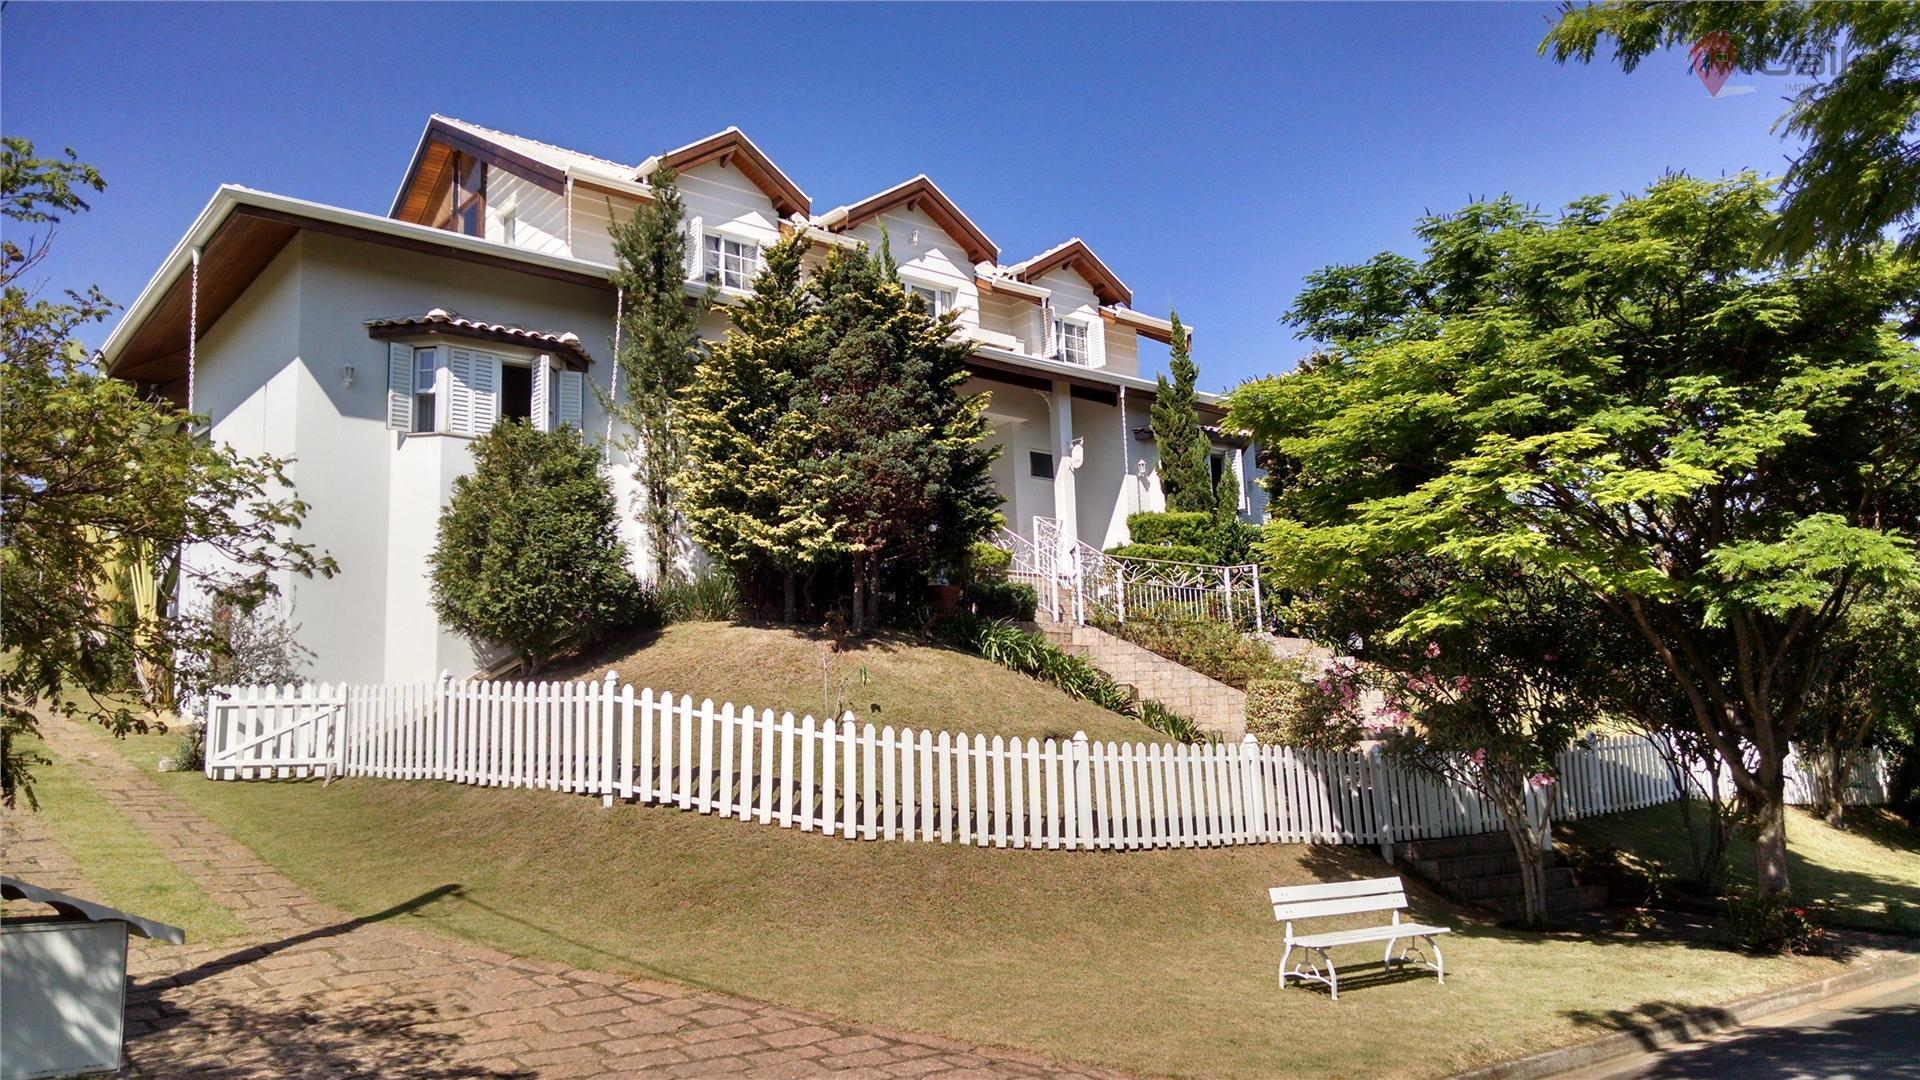 Casa Residencial à venda, Condomínio Jardim Primavera, Louveira - CA0562.